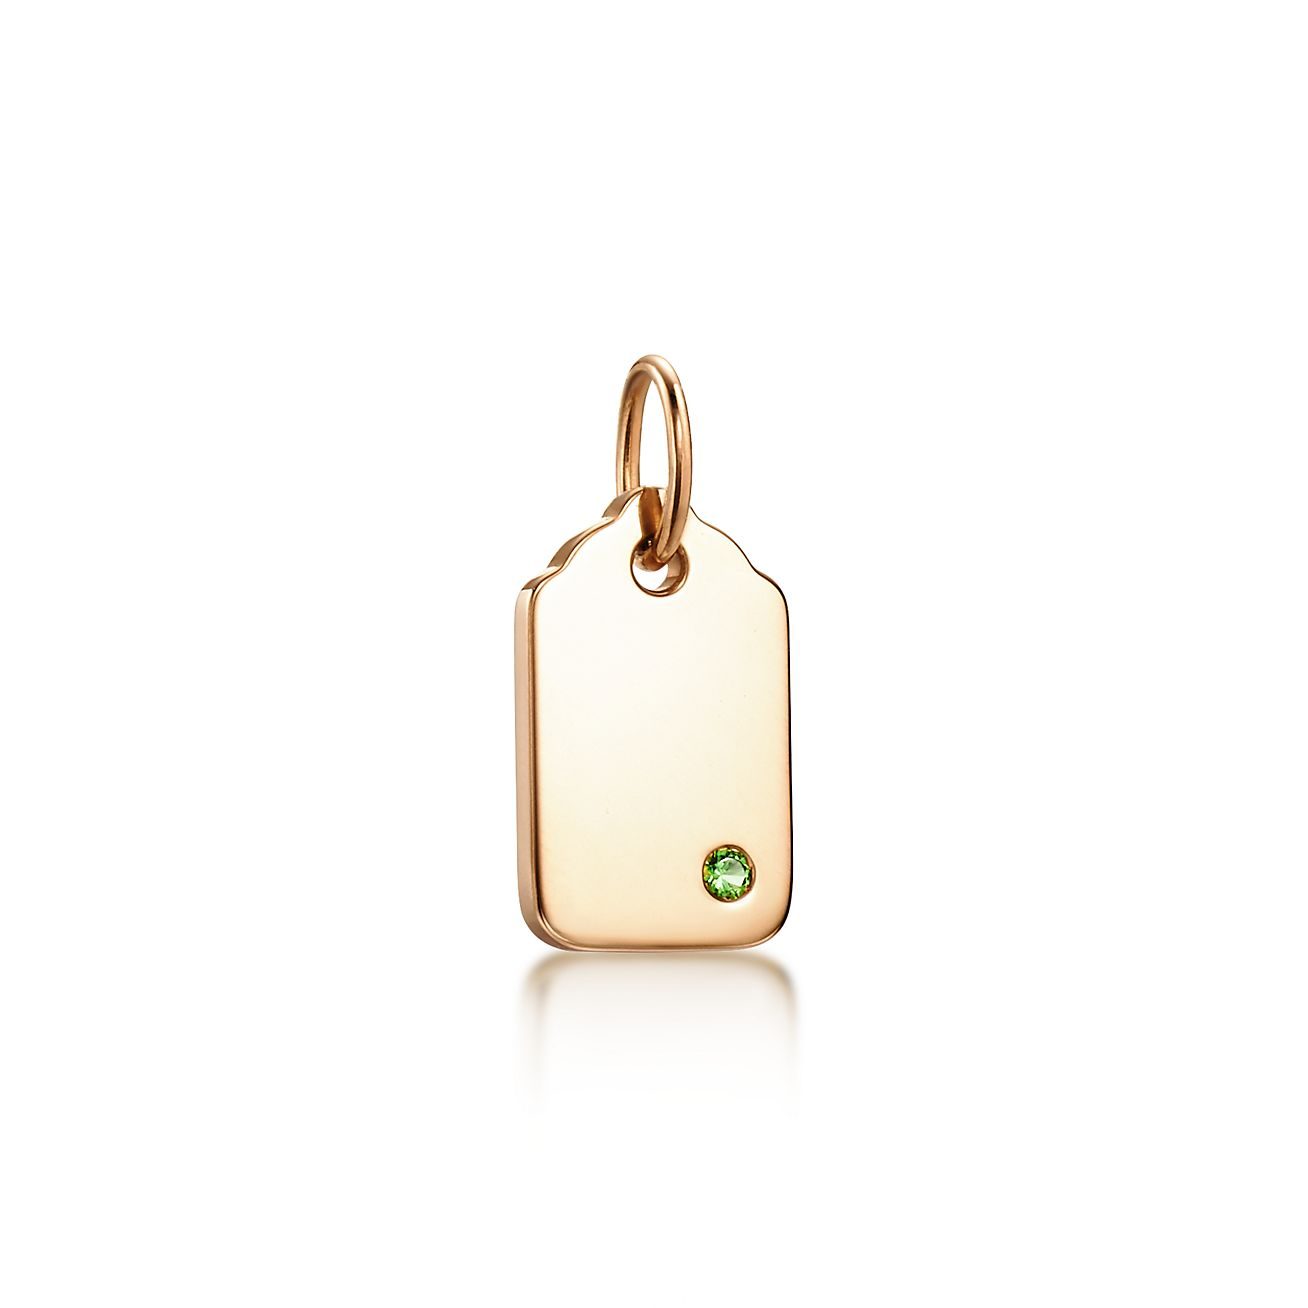 Encantos Tiffany Etiqueta Redondeada En Oro De 18k Con Un Tsavorite, Mini Tiffany & Co.